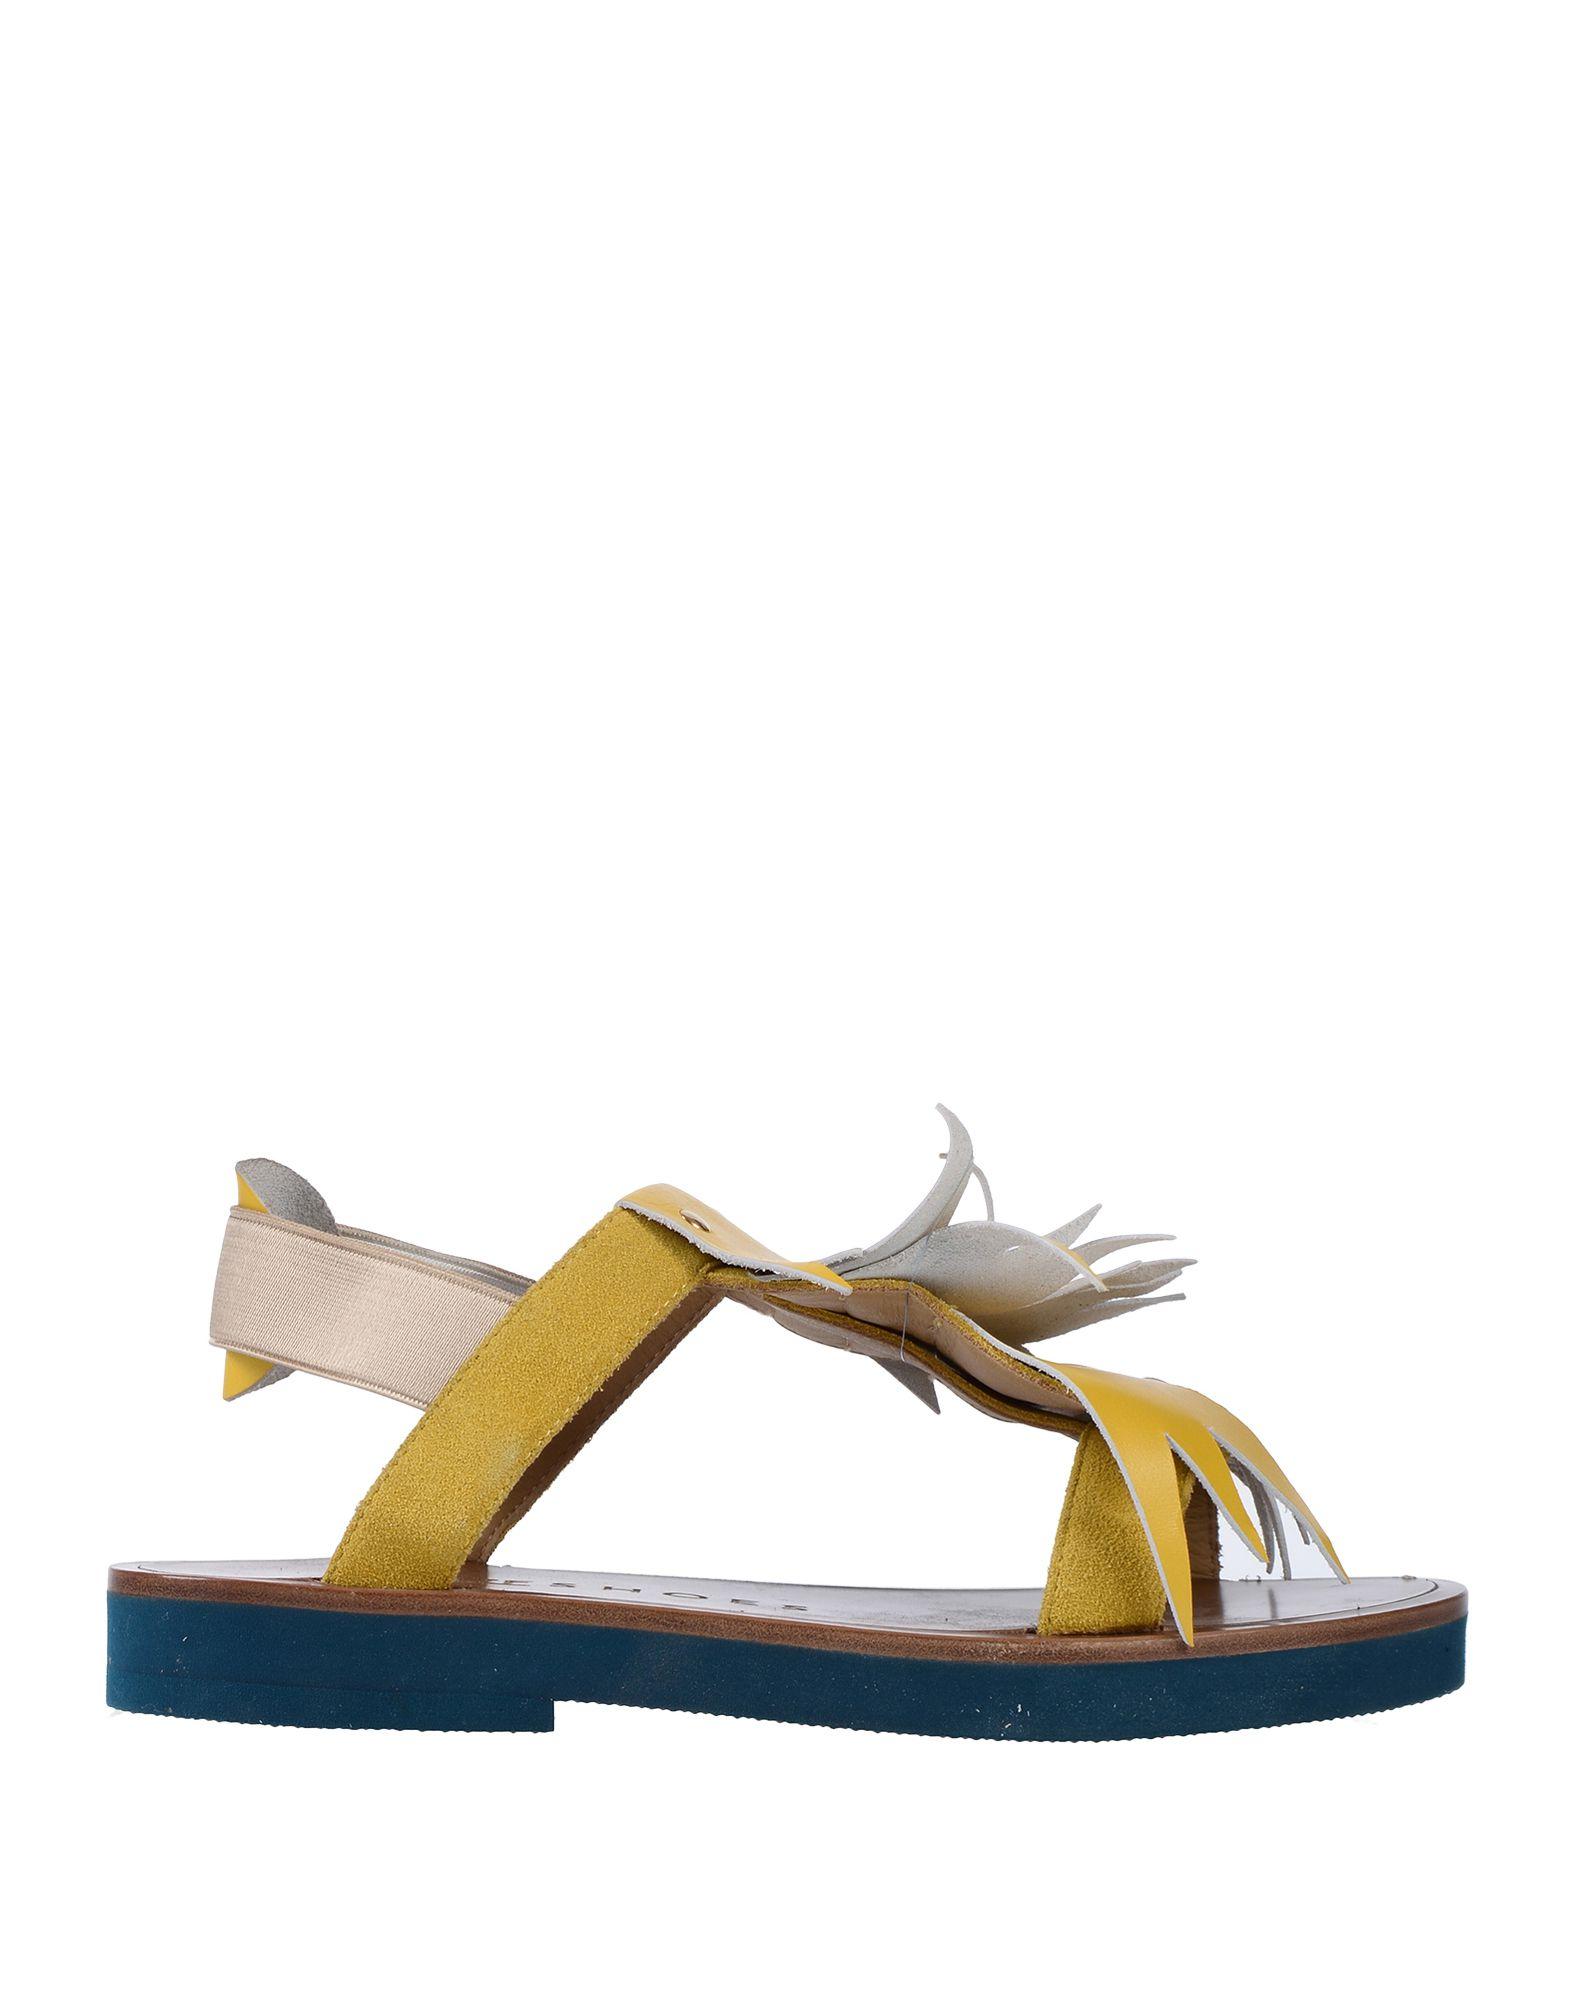 L'F SHOES Вьетнамки shoes and more вьетнамки